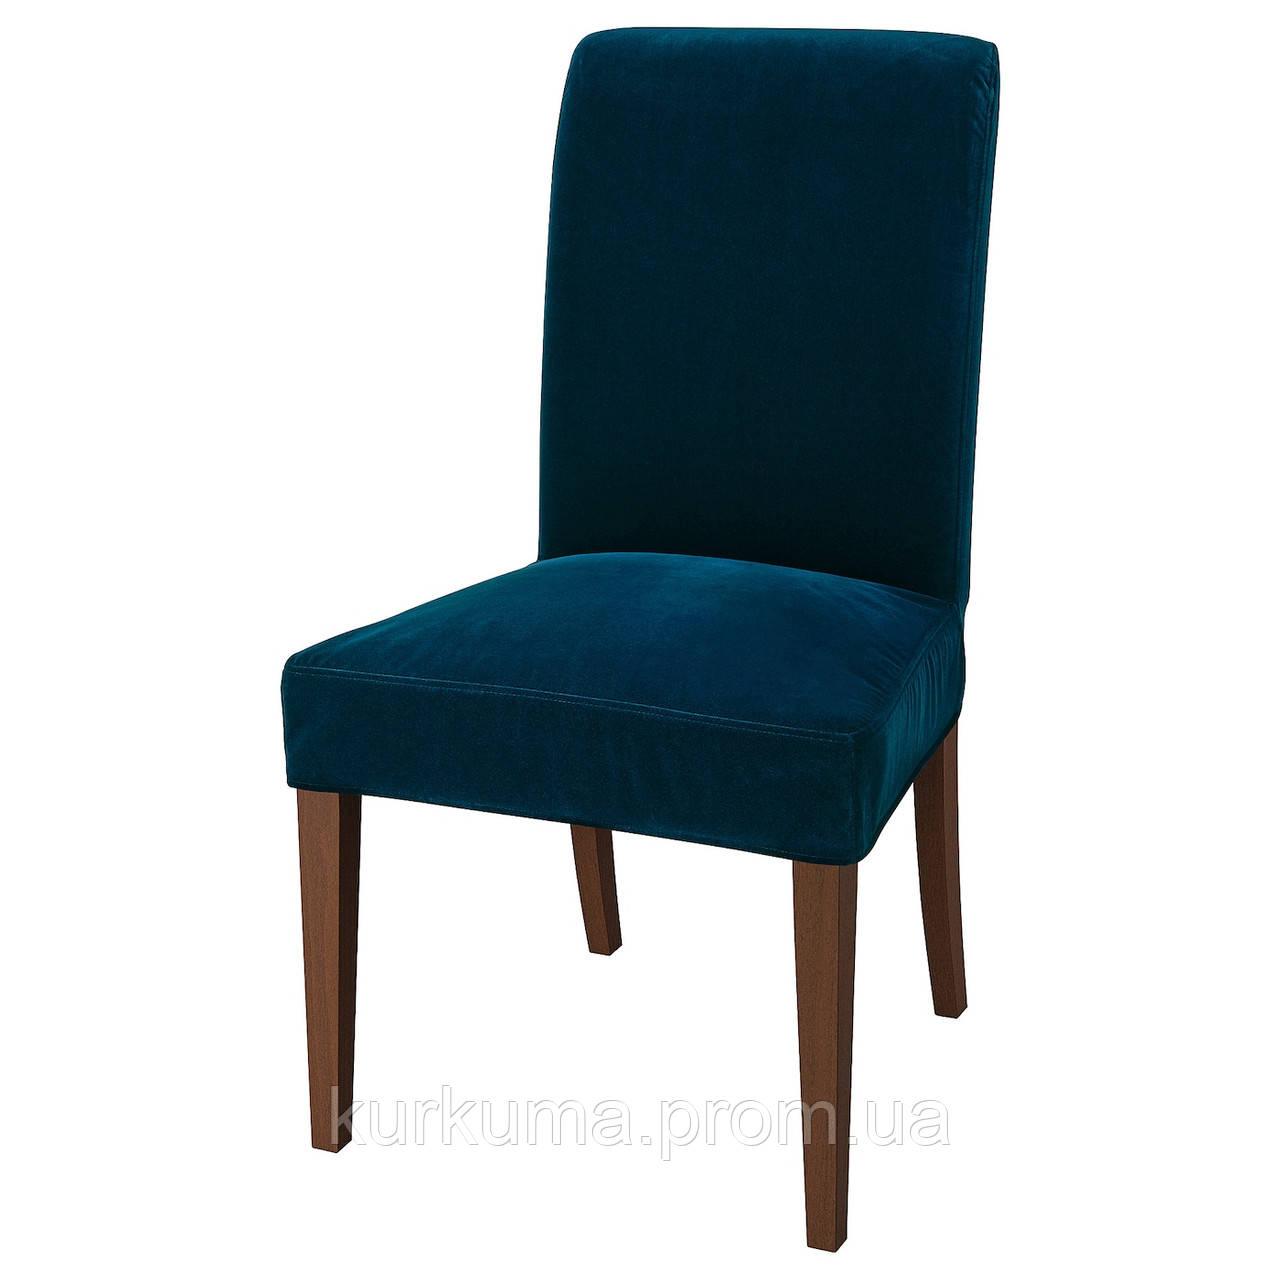 IKEA HENRIKSDAL Стул, коричневый, Джупарп темно-зеленый синий (293.370.54)